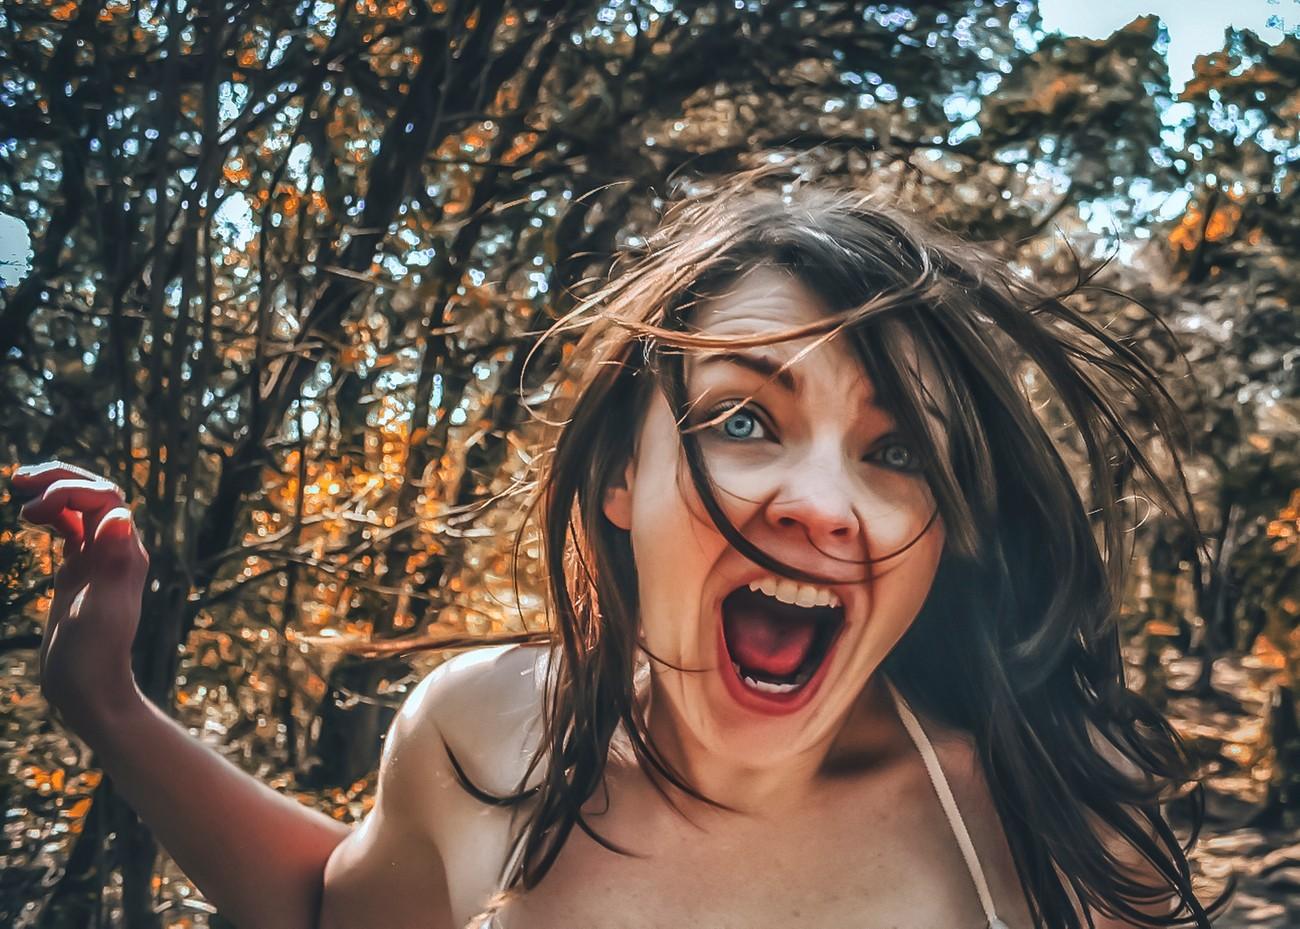 Distinctive Expressions Photo Contest Winner